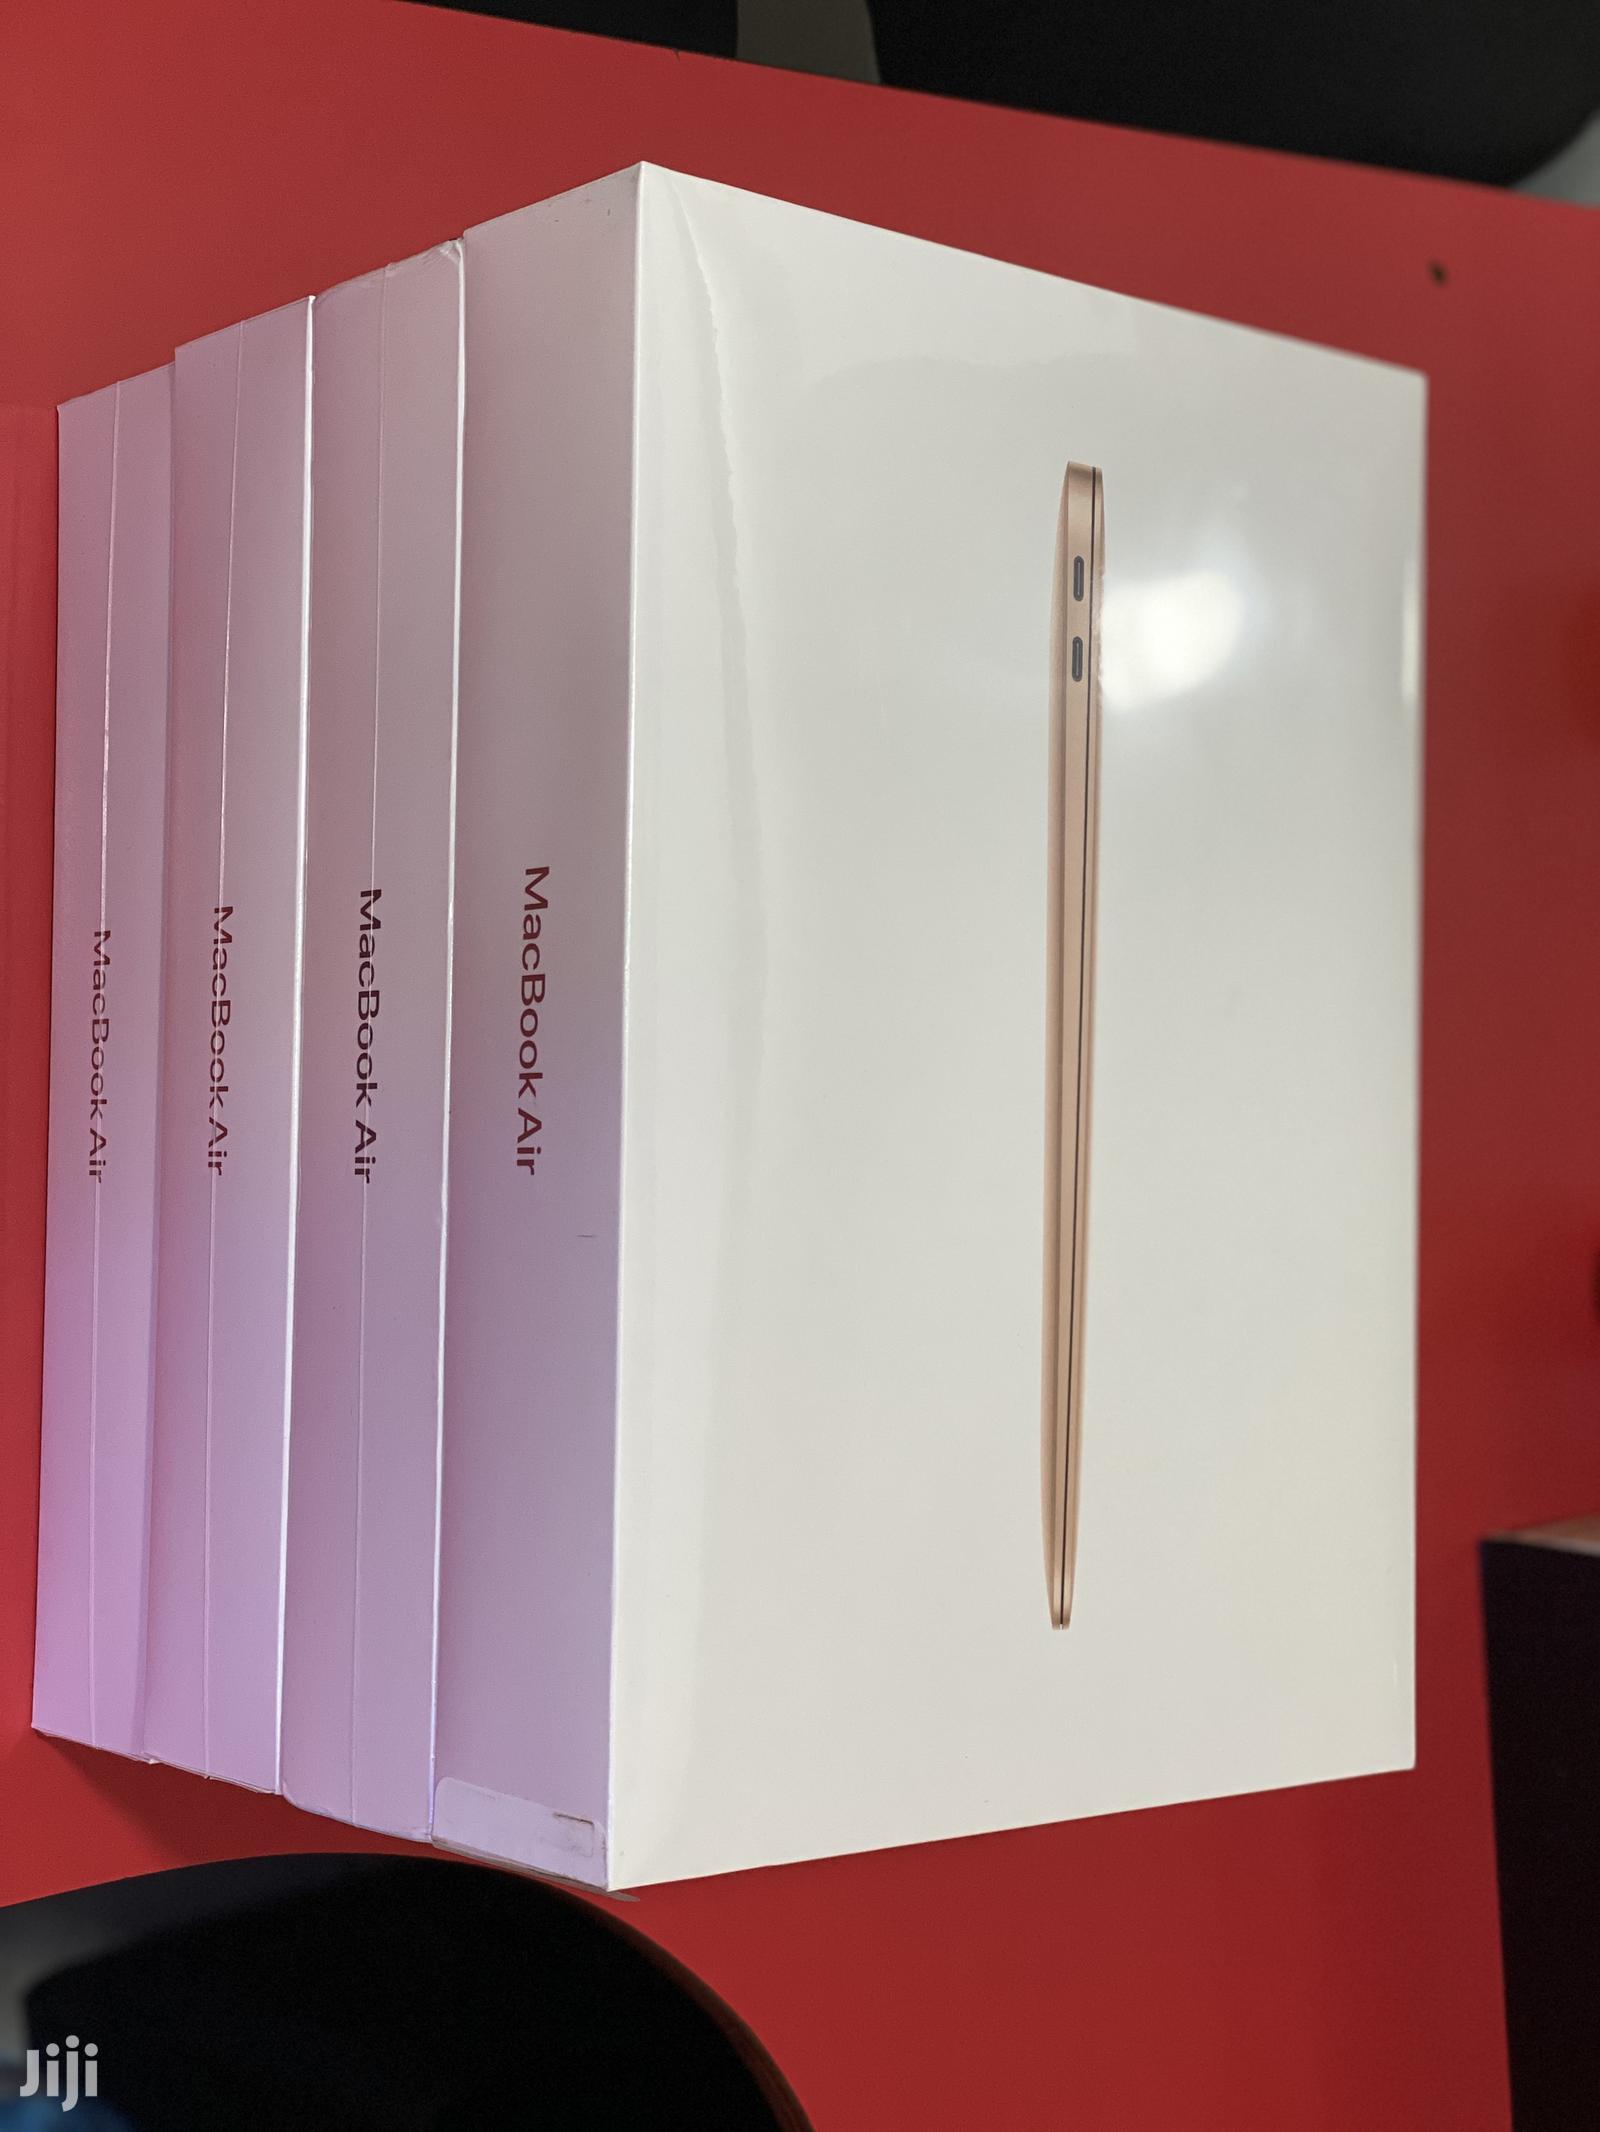 New Laptop Apple MacBook Air 8GB Intel Core i3 SSHD (Hybrid) 256GB | Laptops & Computers for sale in Kampala, Central Region, Uganda